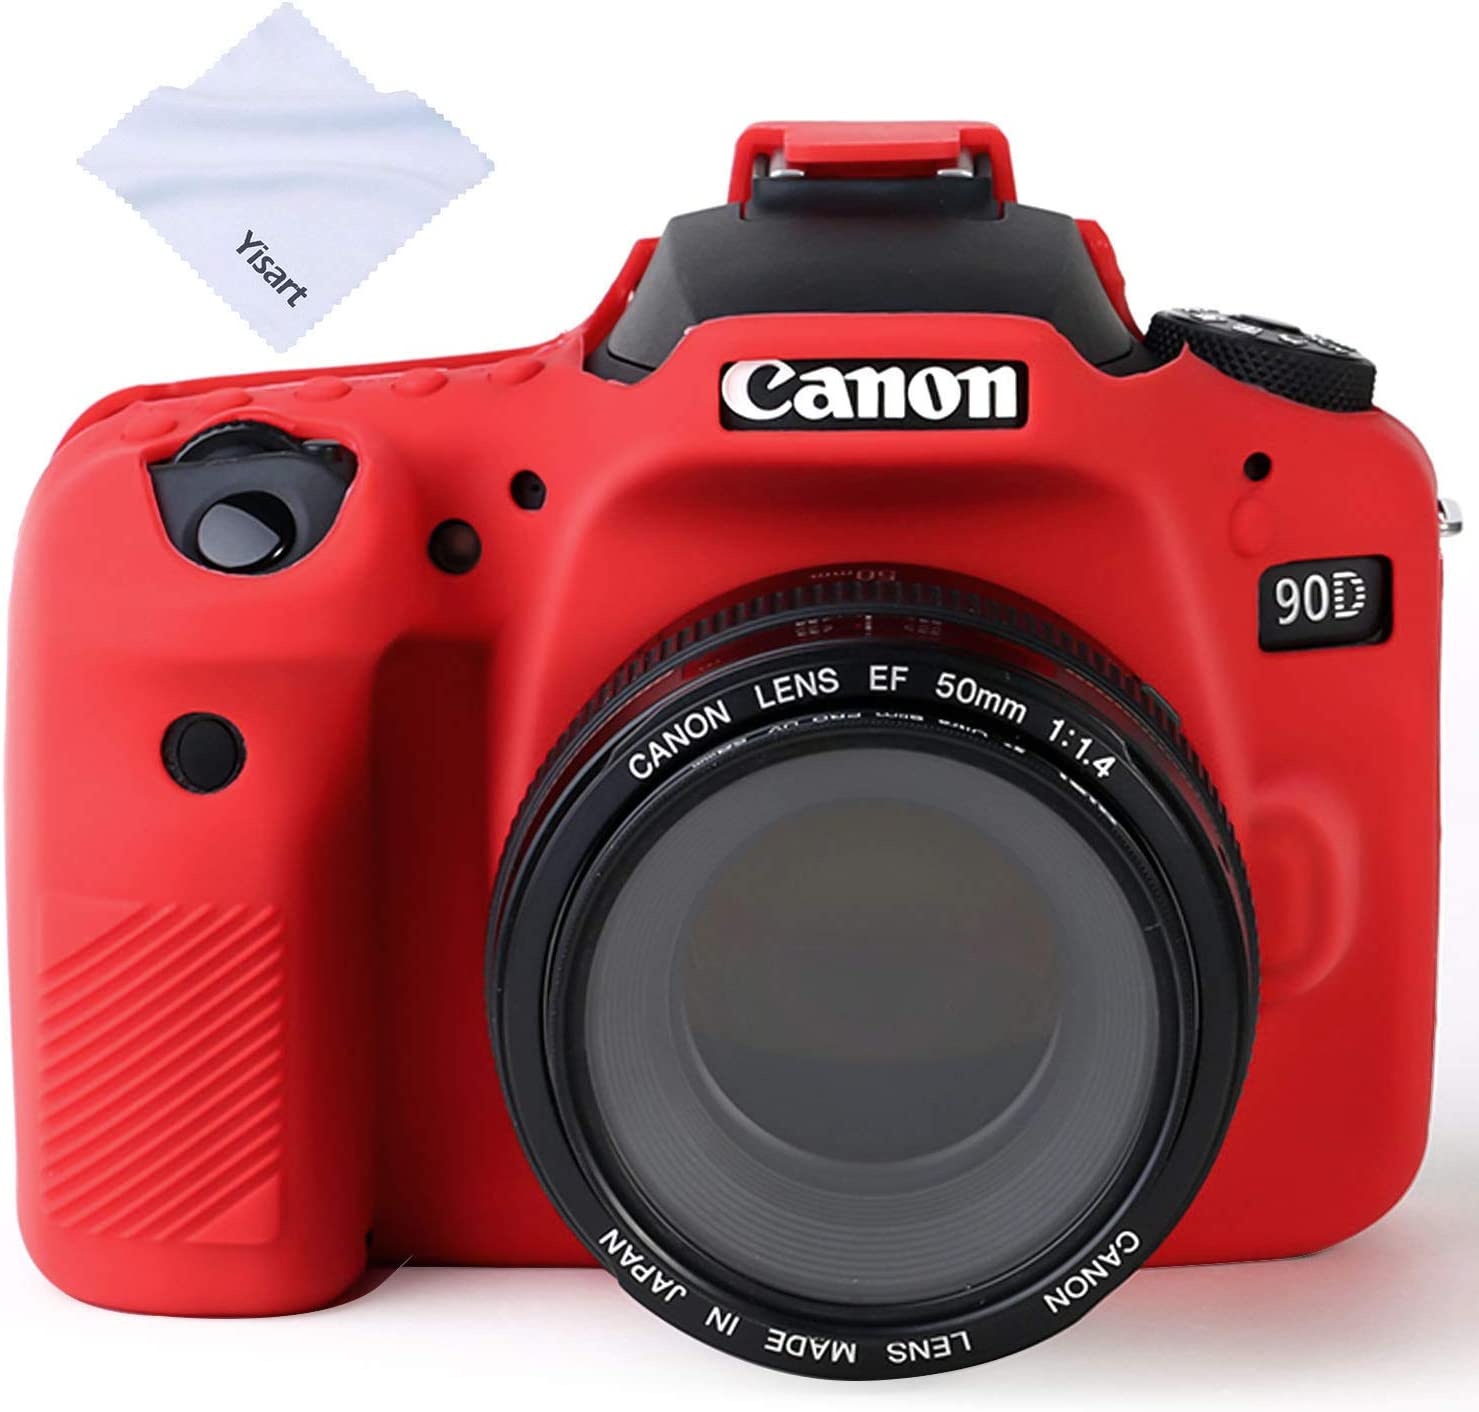 Yisau 90D Camera Case Professional Silicone Camera Case for Canon EOS 90D Camera Canon Rebel EOS 90D Camera Beautiful Companion (Red)